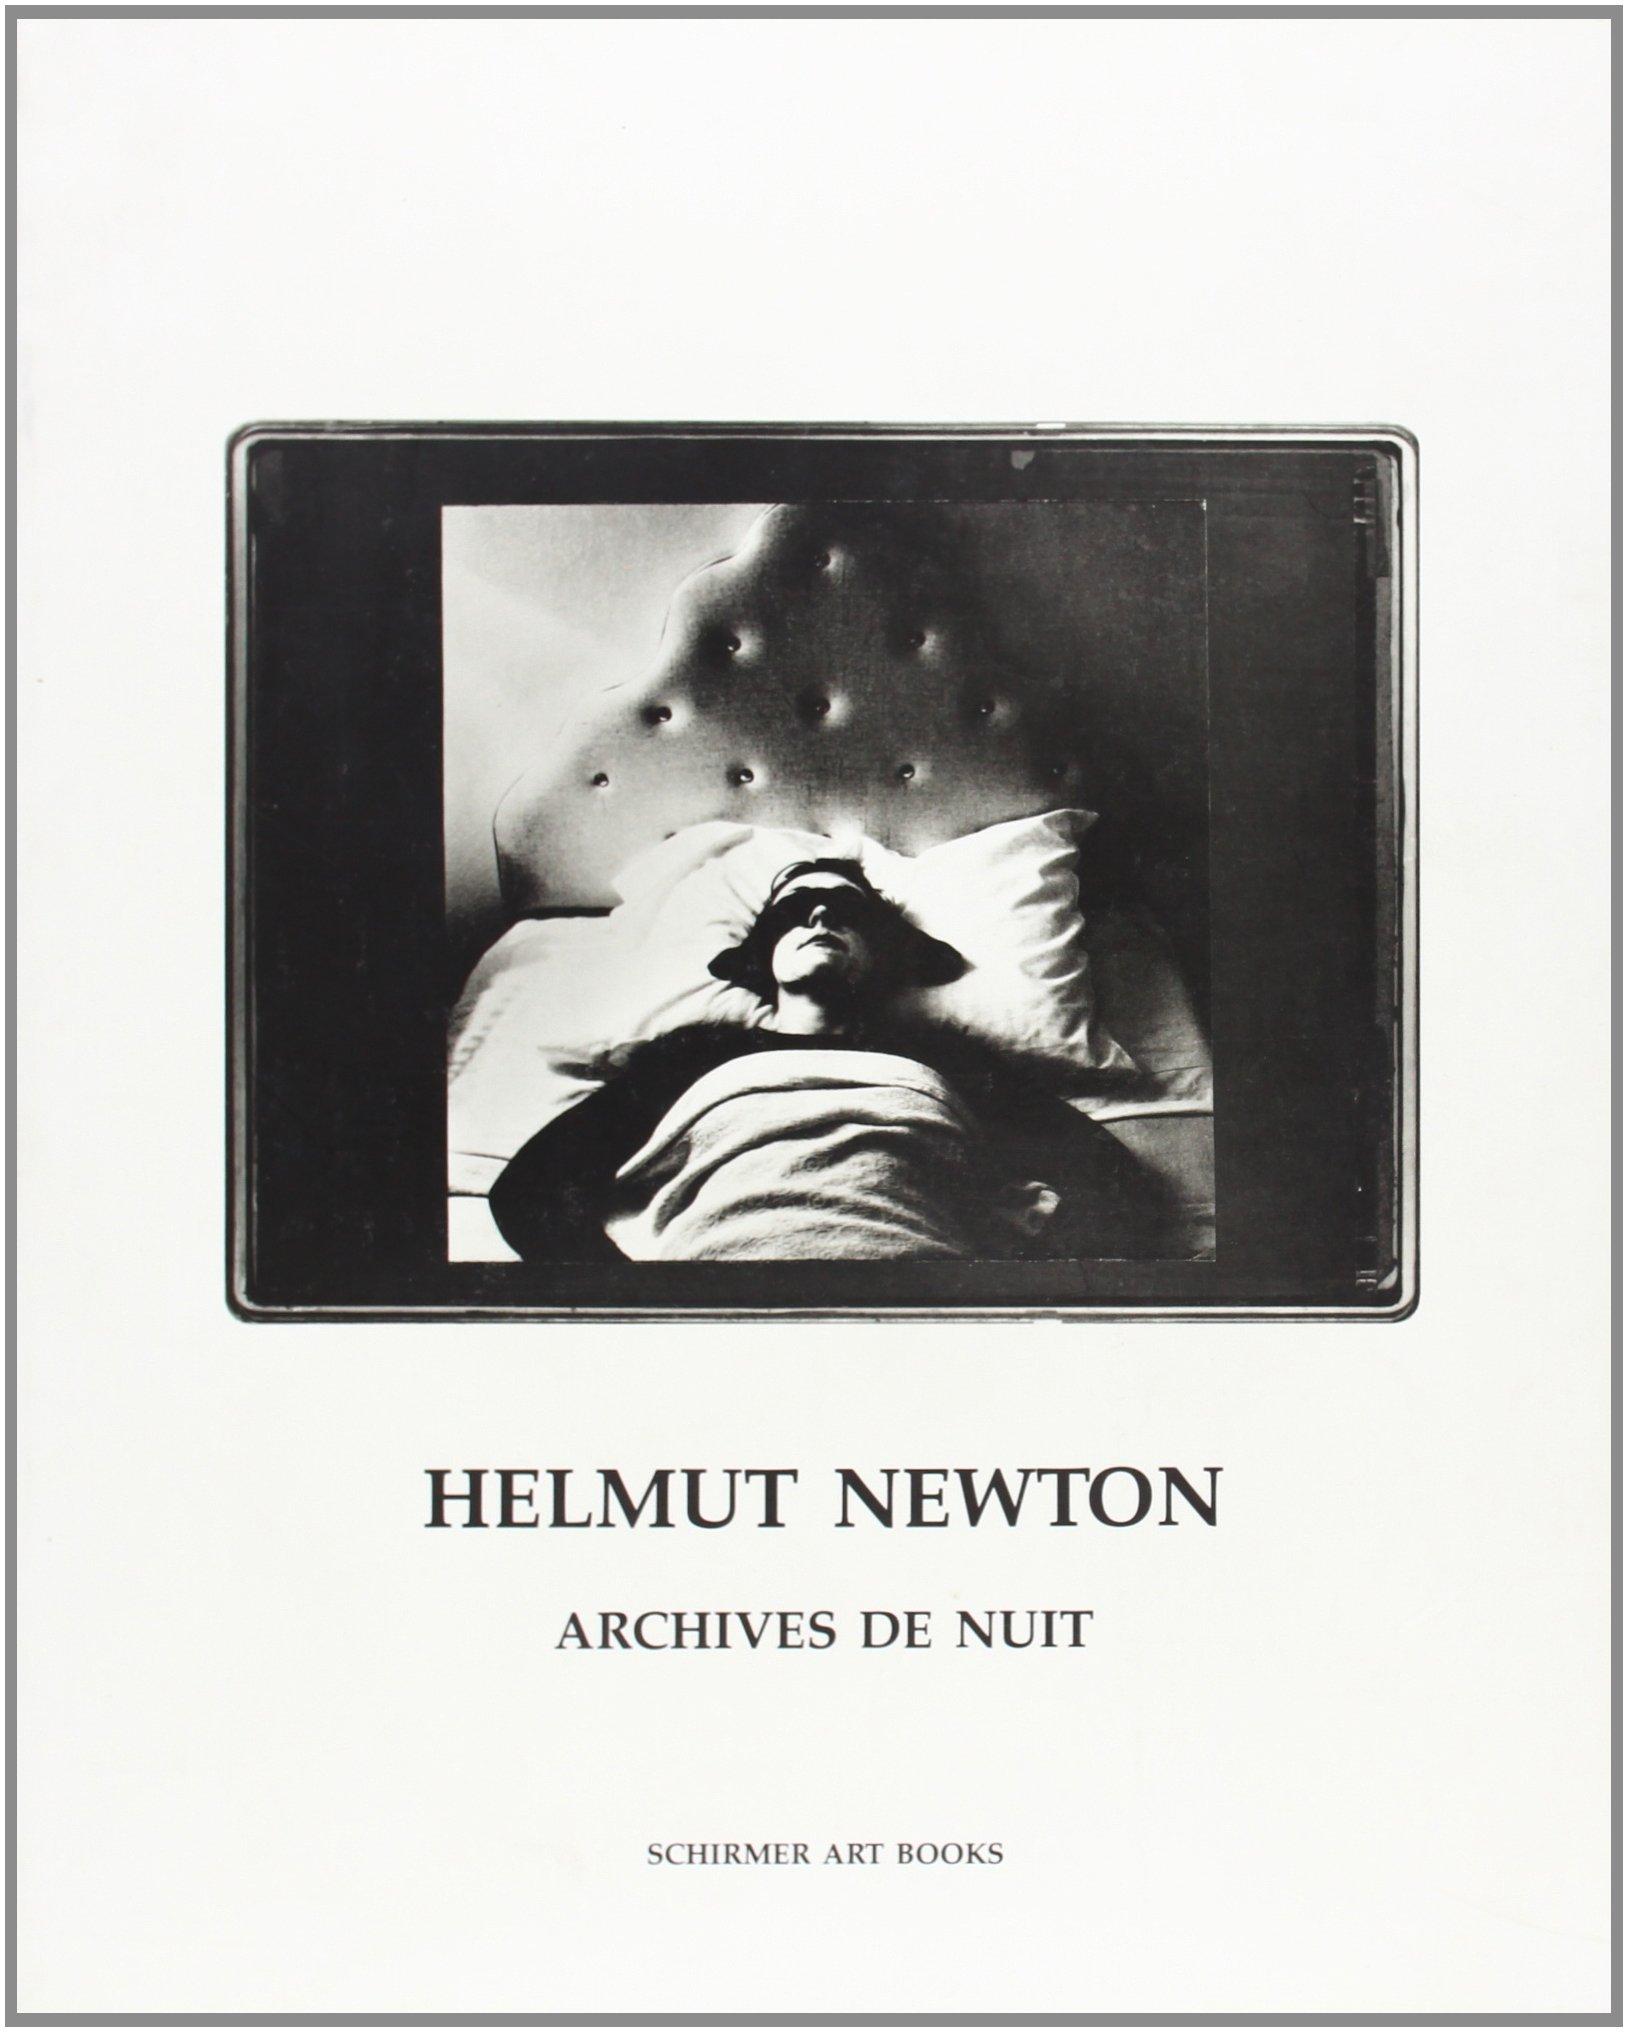 Archives de Nuit (Schirmer art books on art, photography & erotics)